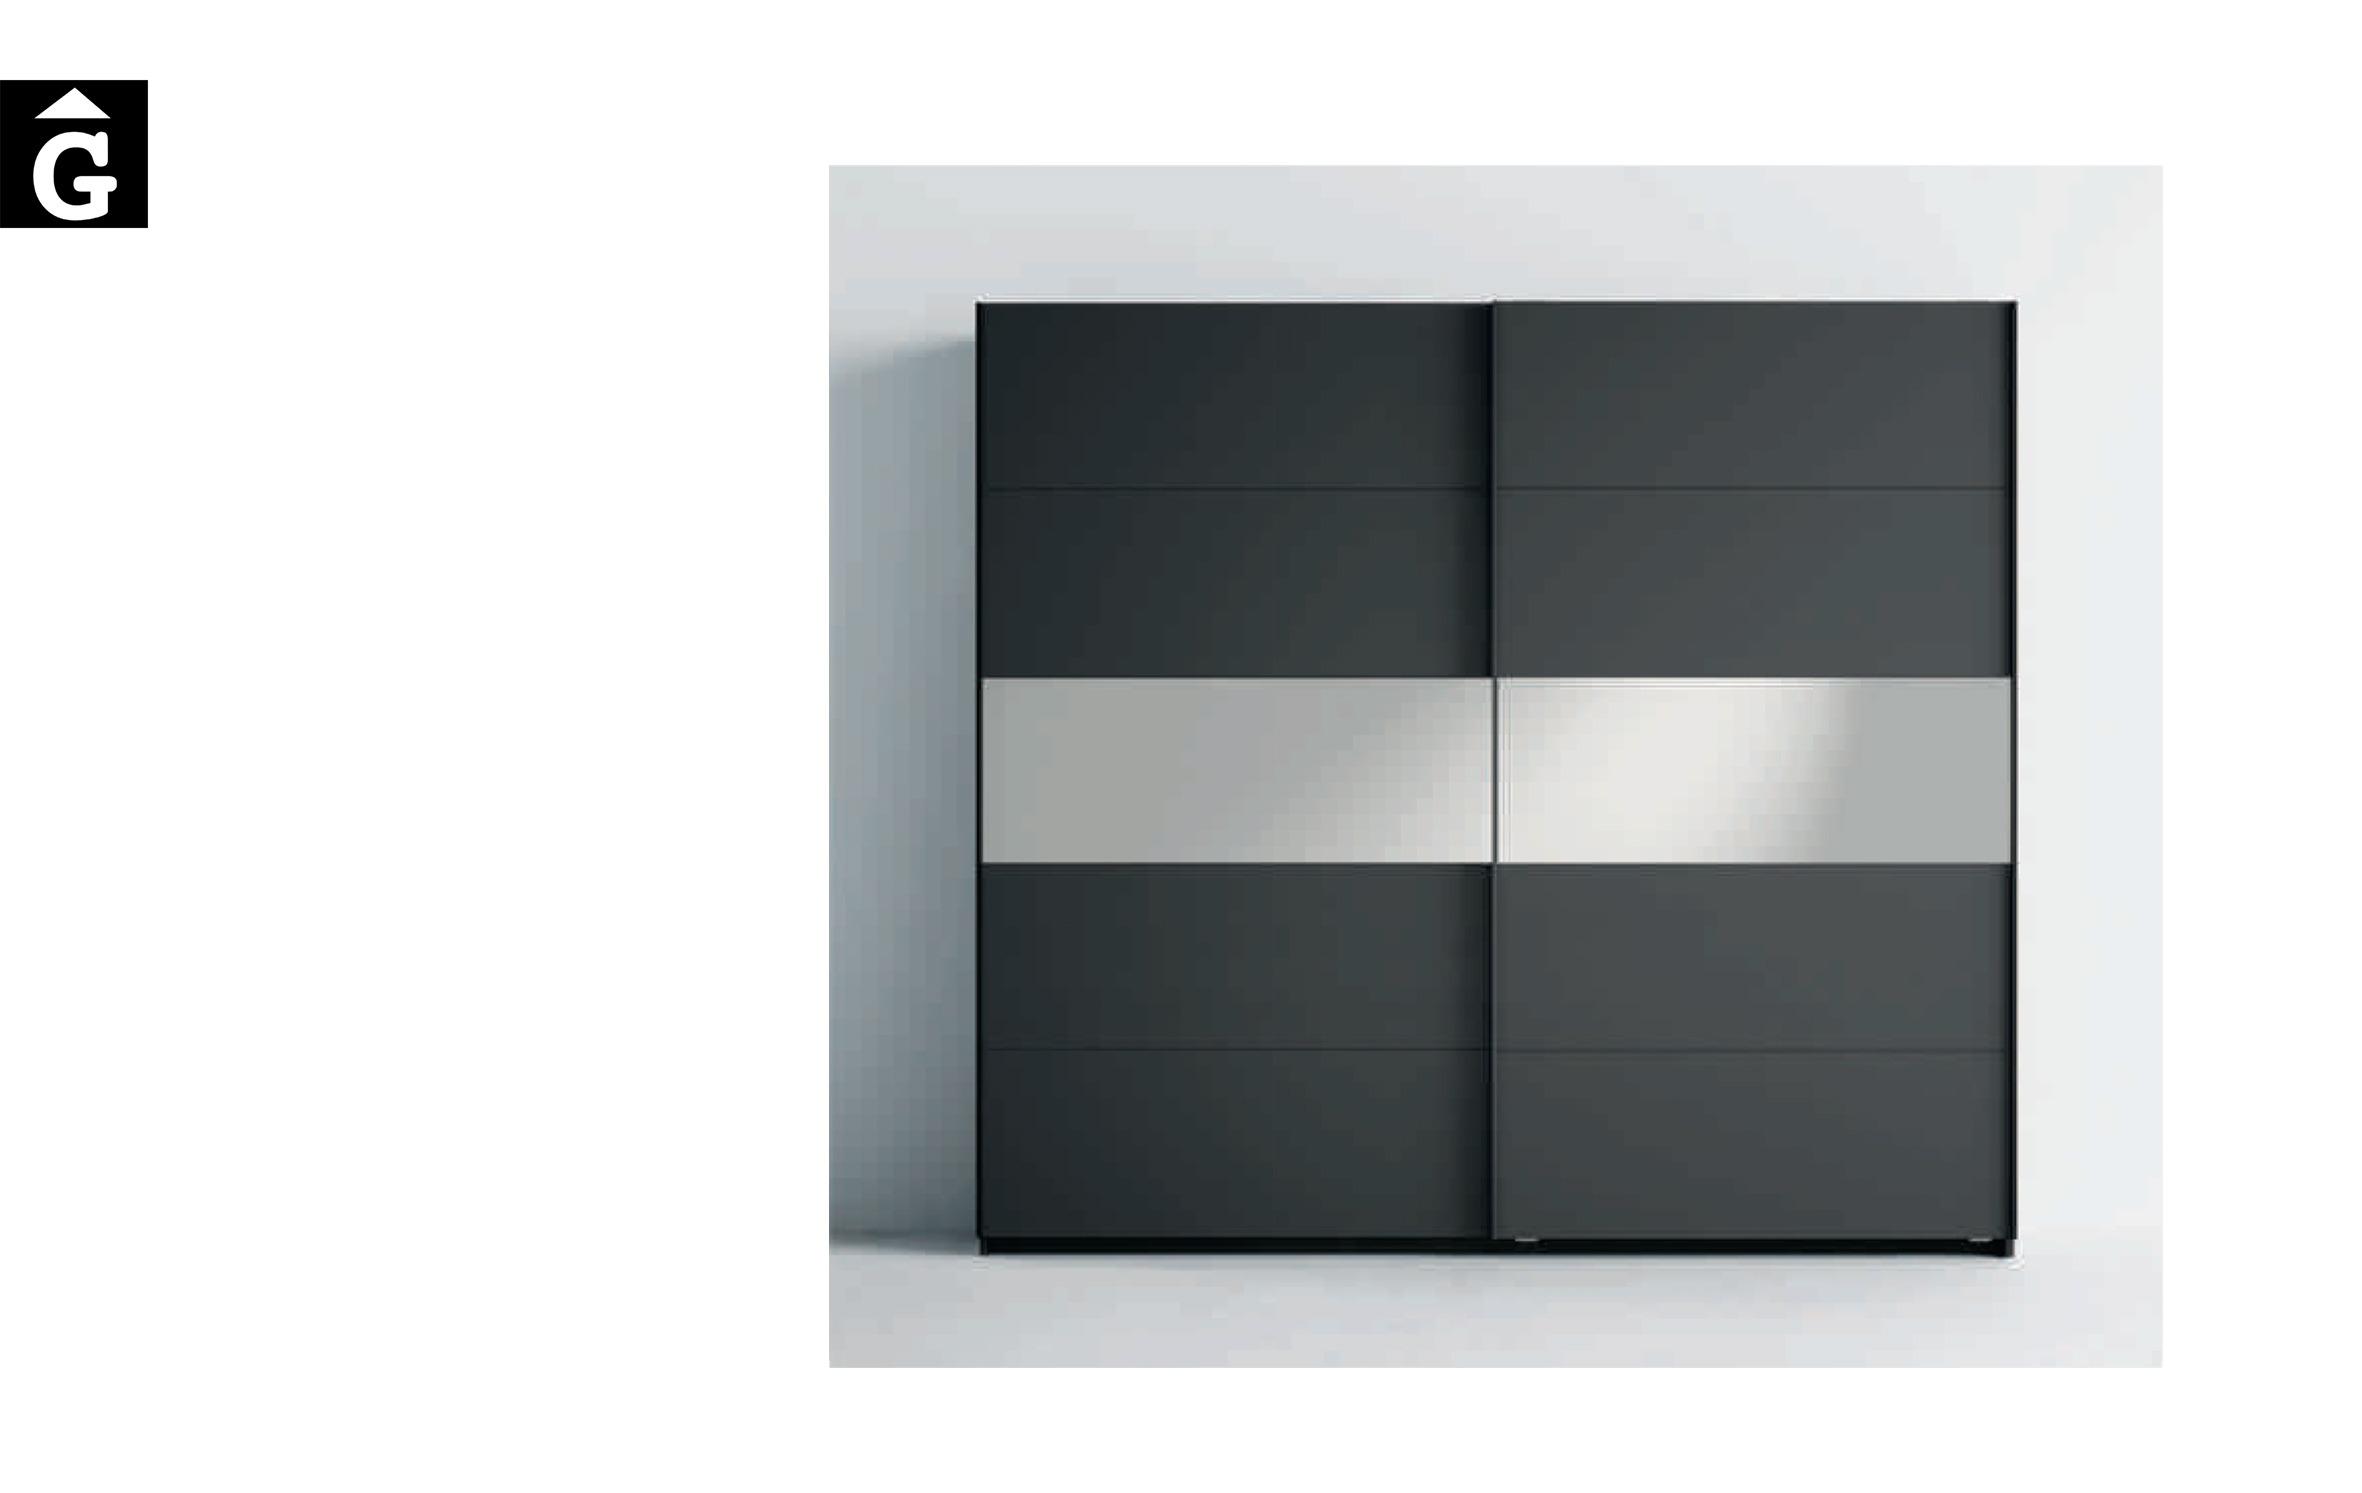 Lagrama armari 12 Porta A5 Vidre fosc blau by Mobles GIFREU Girona modern qualitat vanguardia minim elegant atemporal